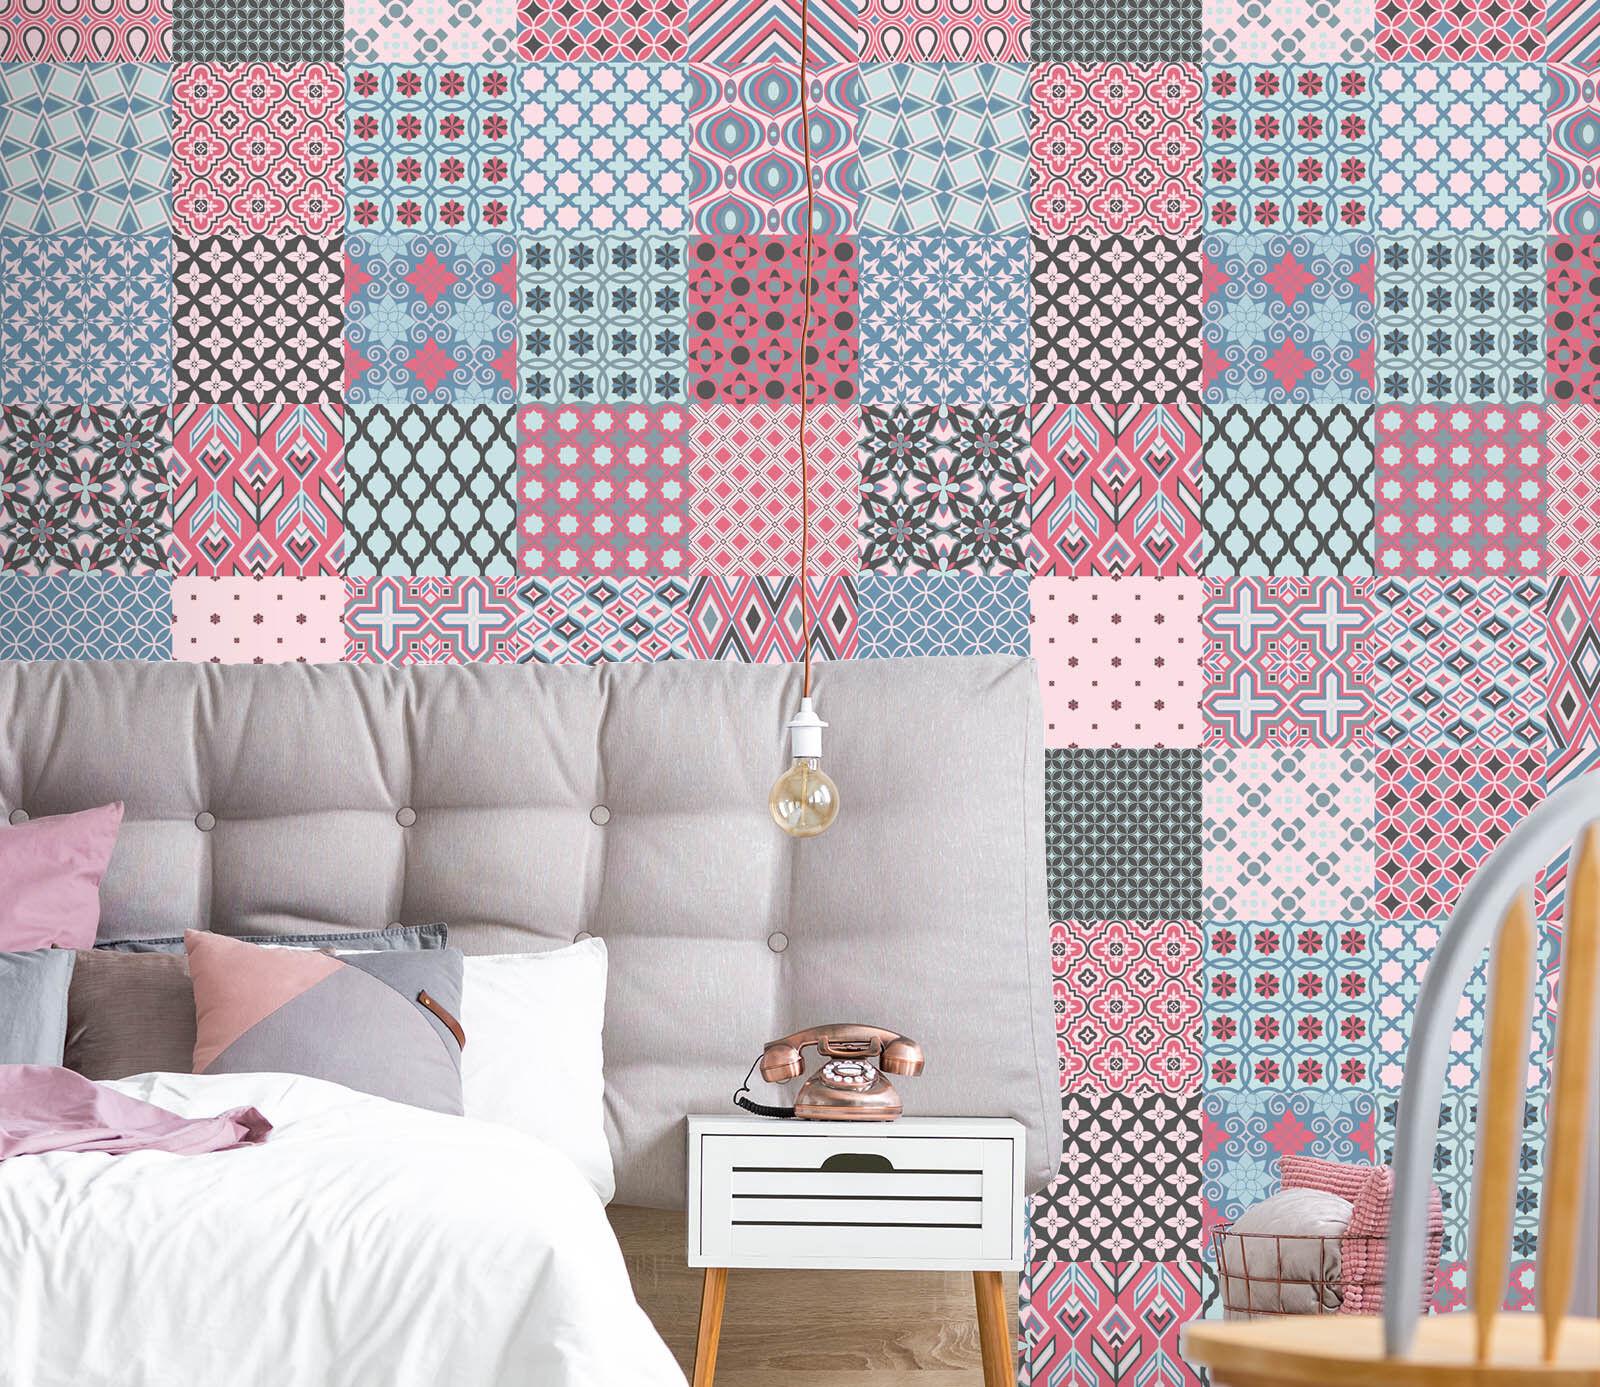 3D Platz Floral Muster 12 Tapete Wandgemälde Tapete Tapeten Familie Kinde DE